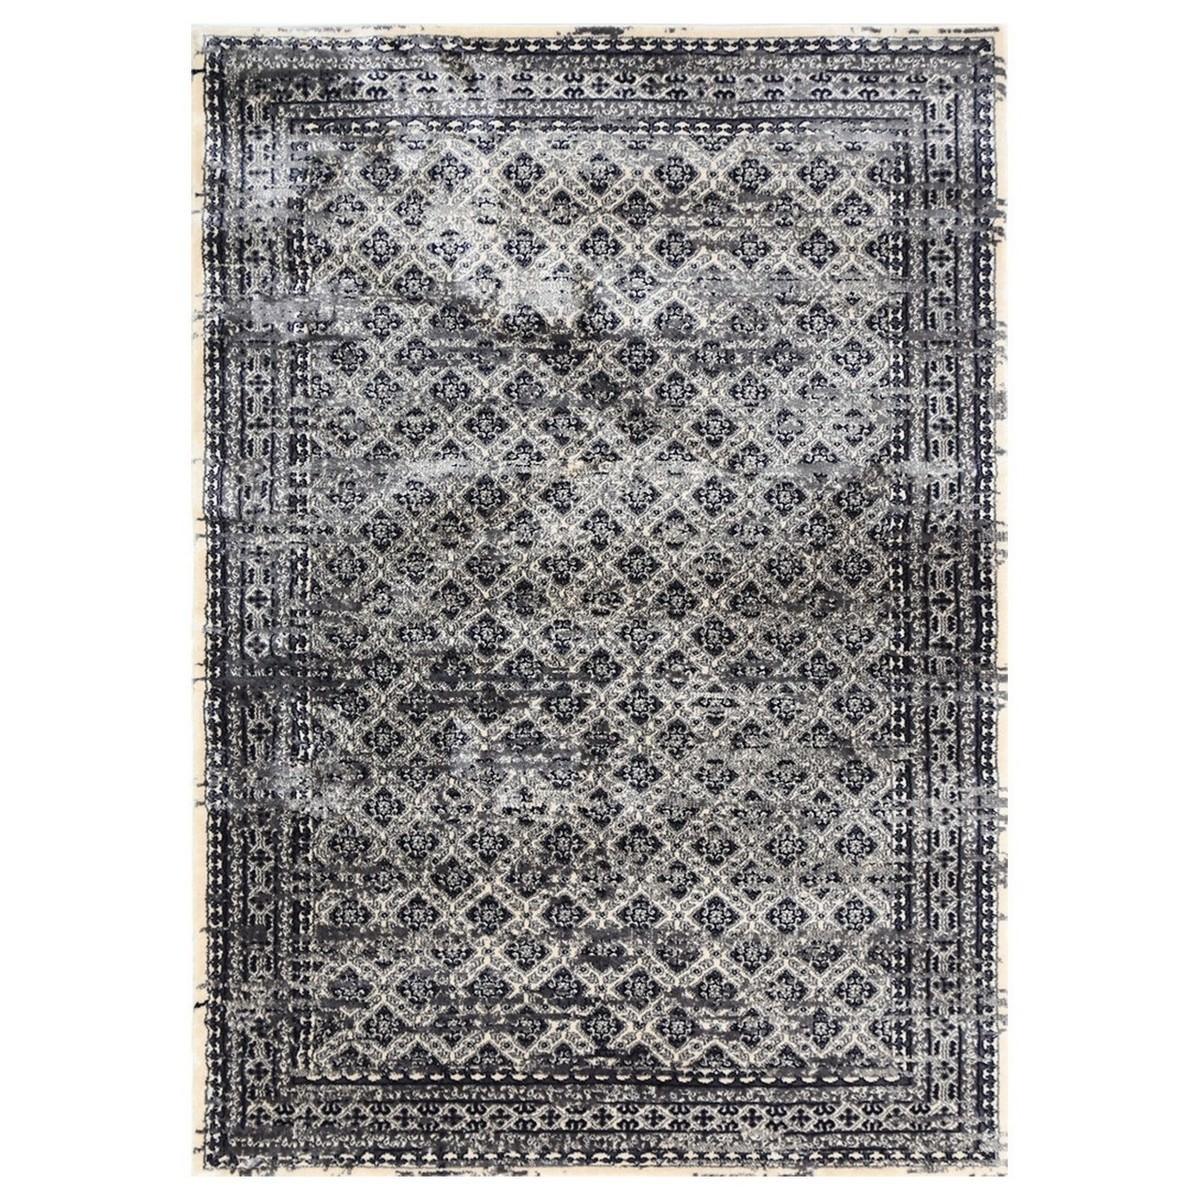 Artifact Hester Distressed Oriental Rug, 80x150cm